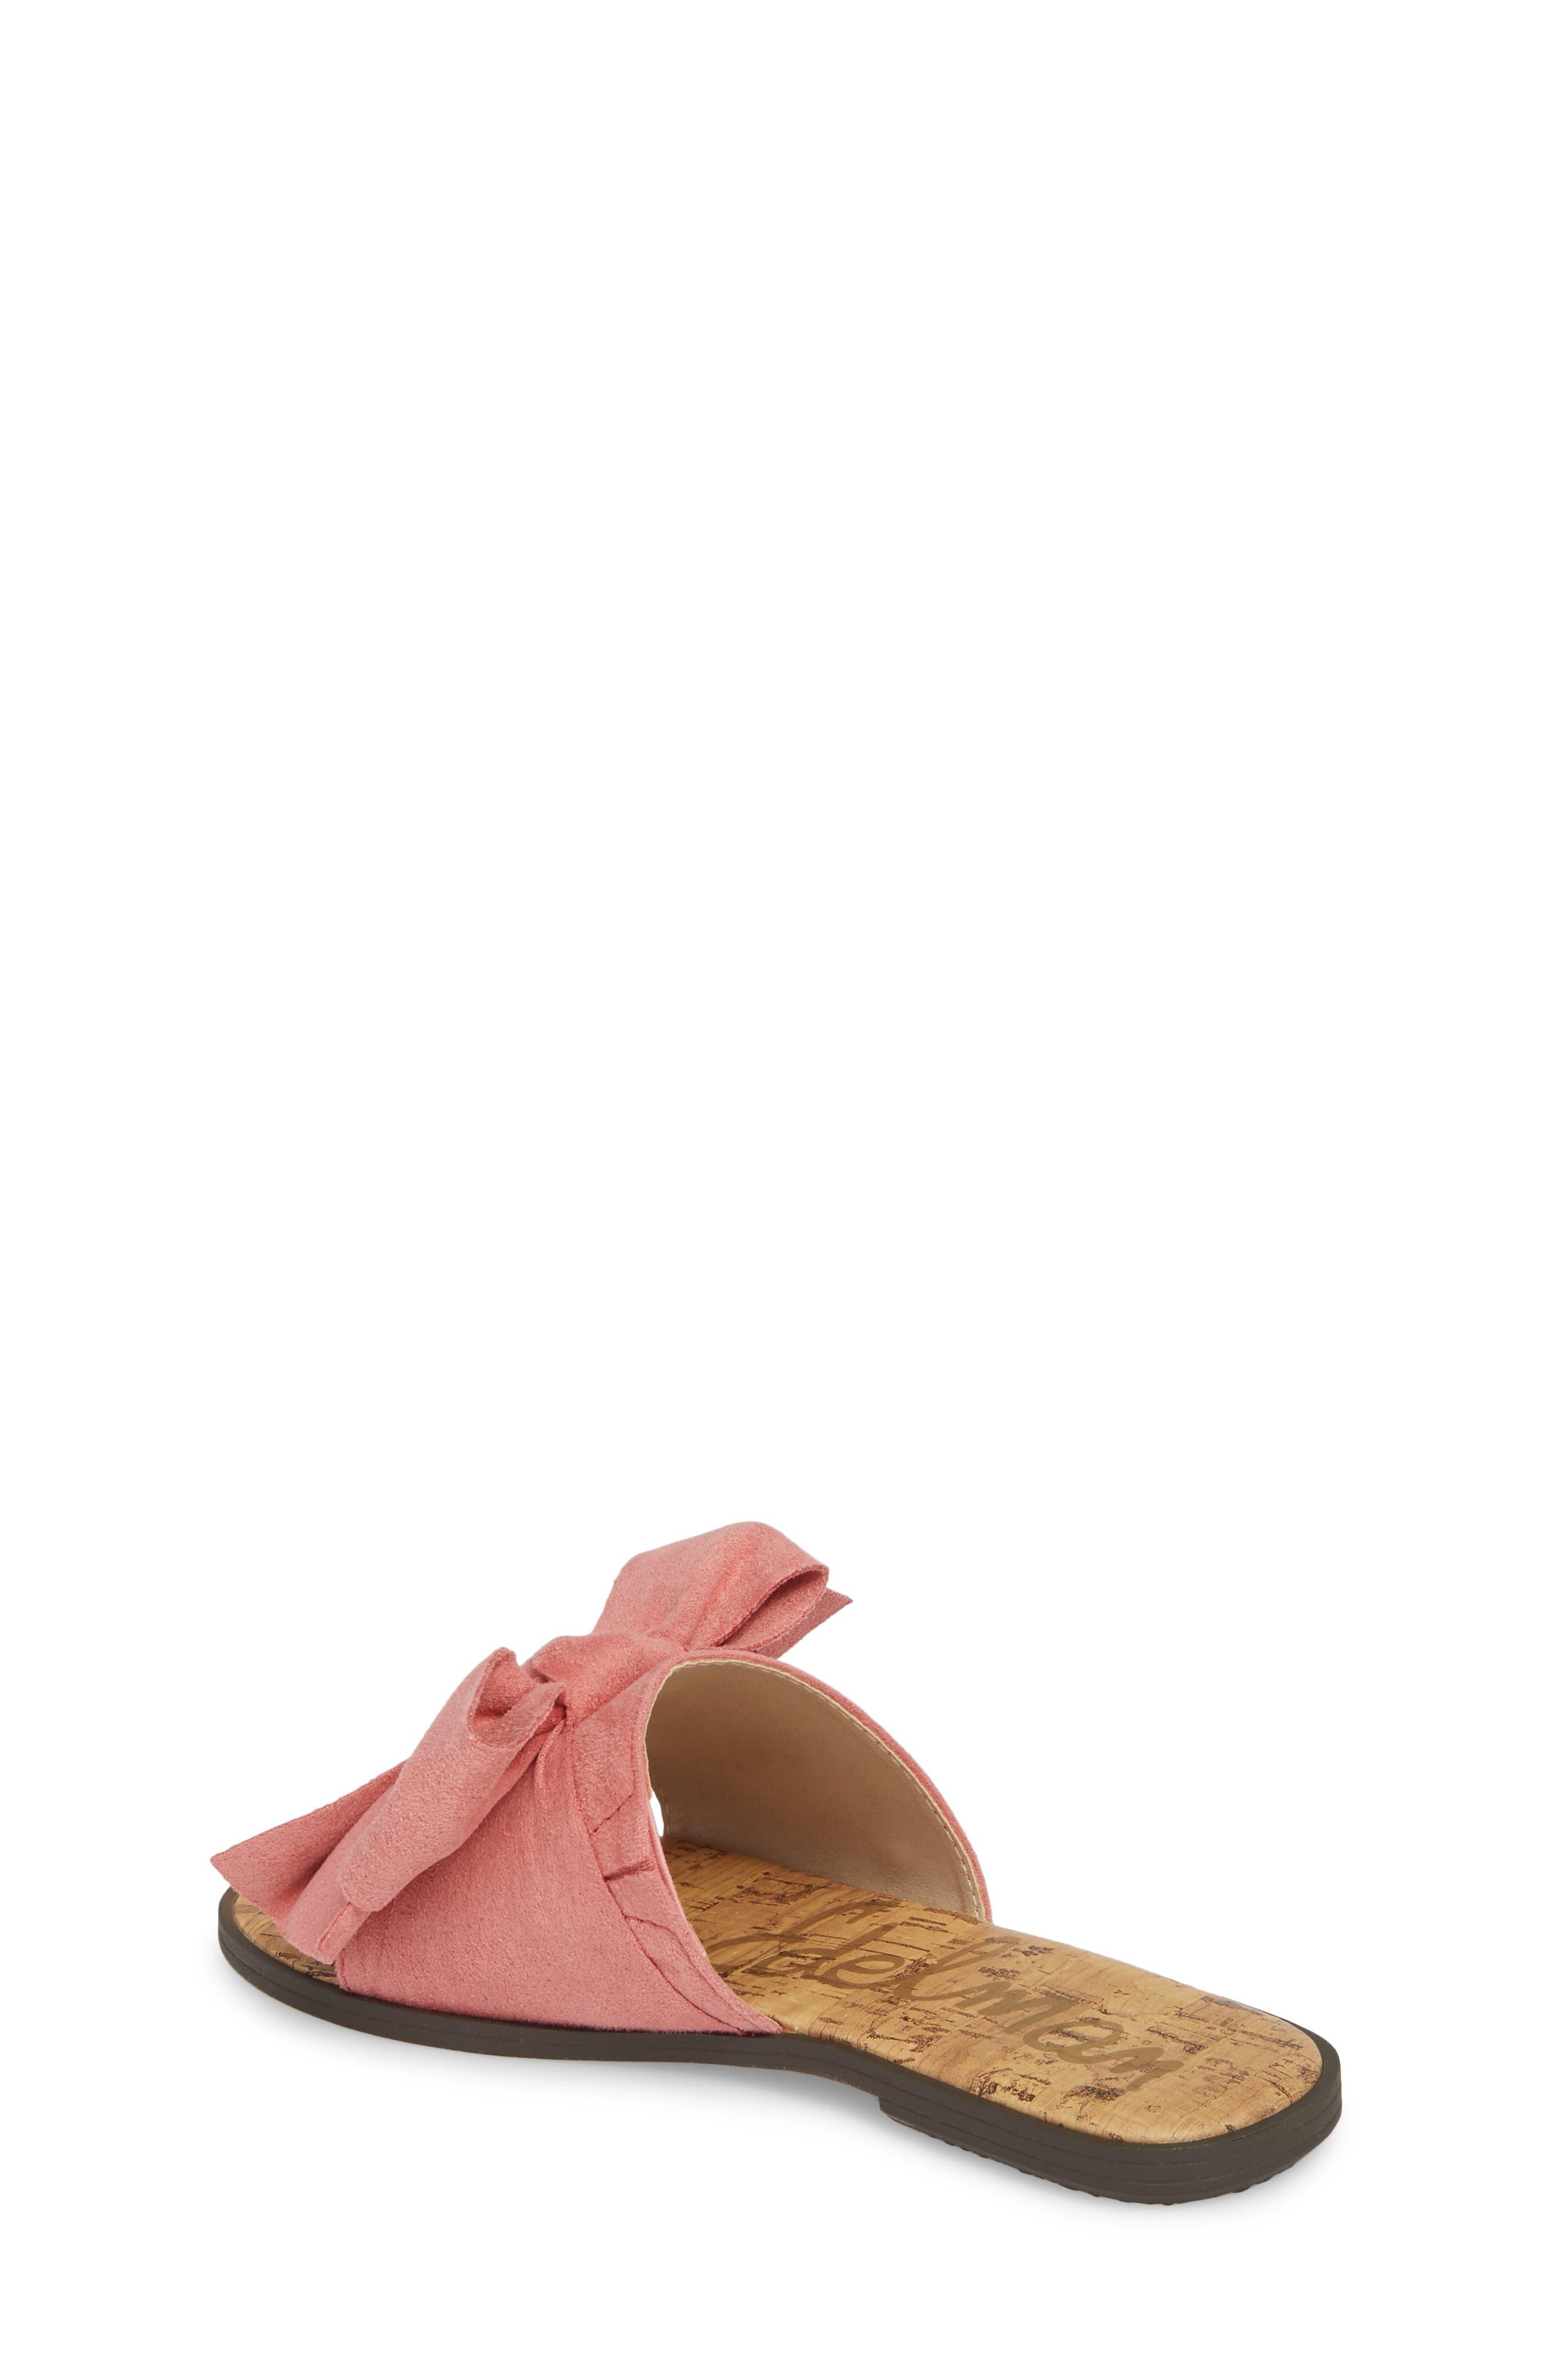 Gigi Bow Faux Leather Sandal,                             Alternate thumbnail 5, color,